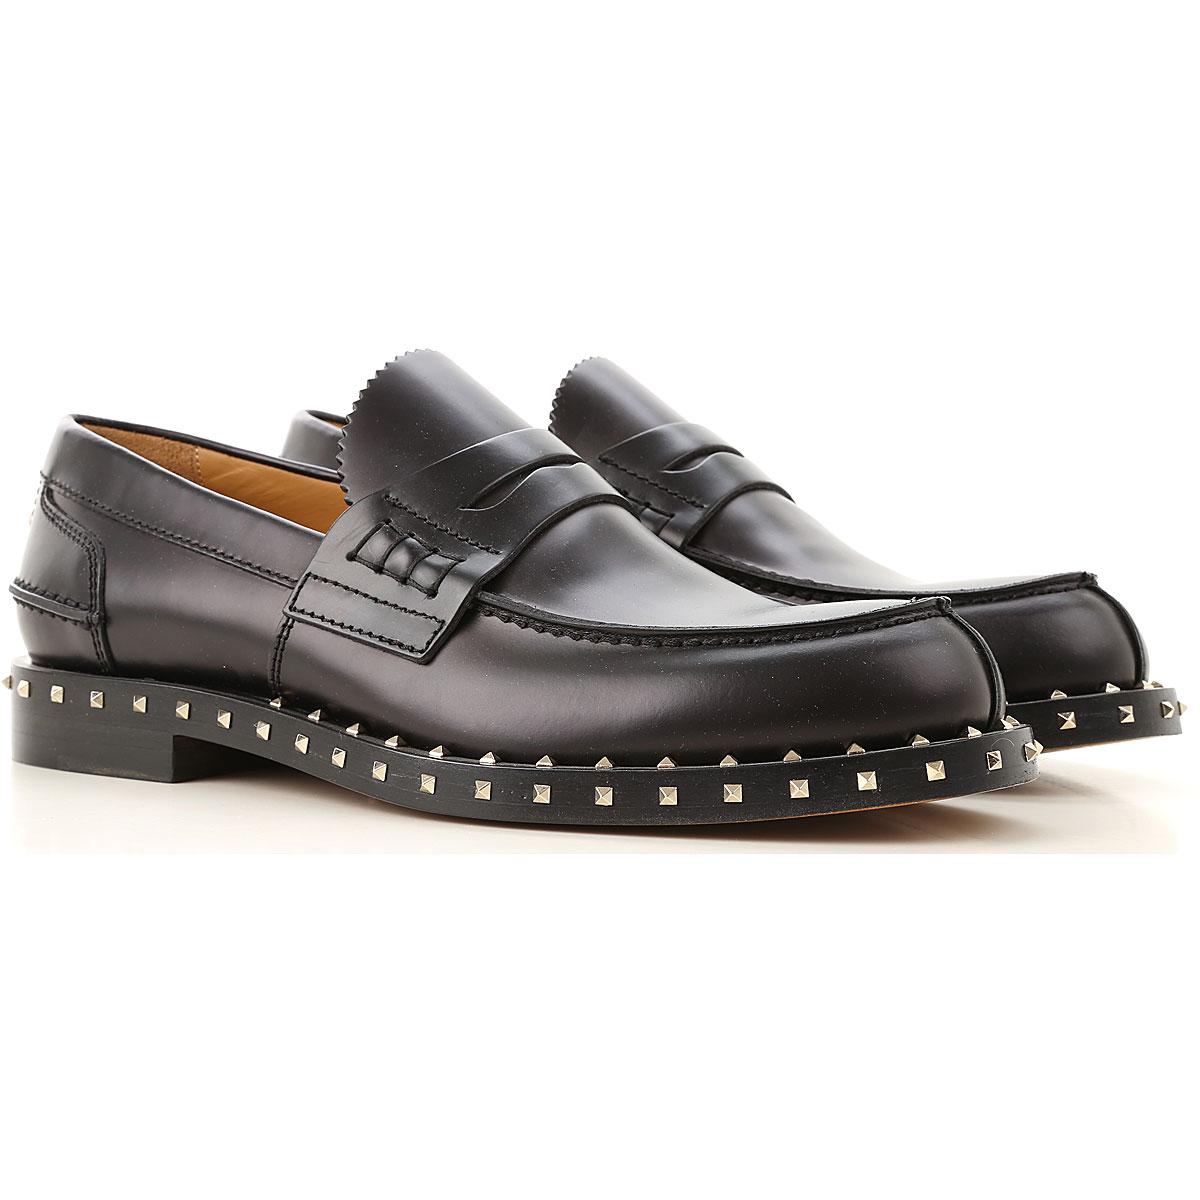 Mens Shoes Valentino Garavani. Style code: ny2s0950-abk-0n0